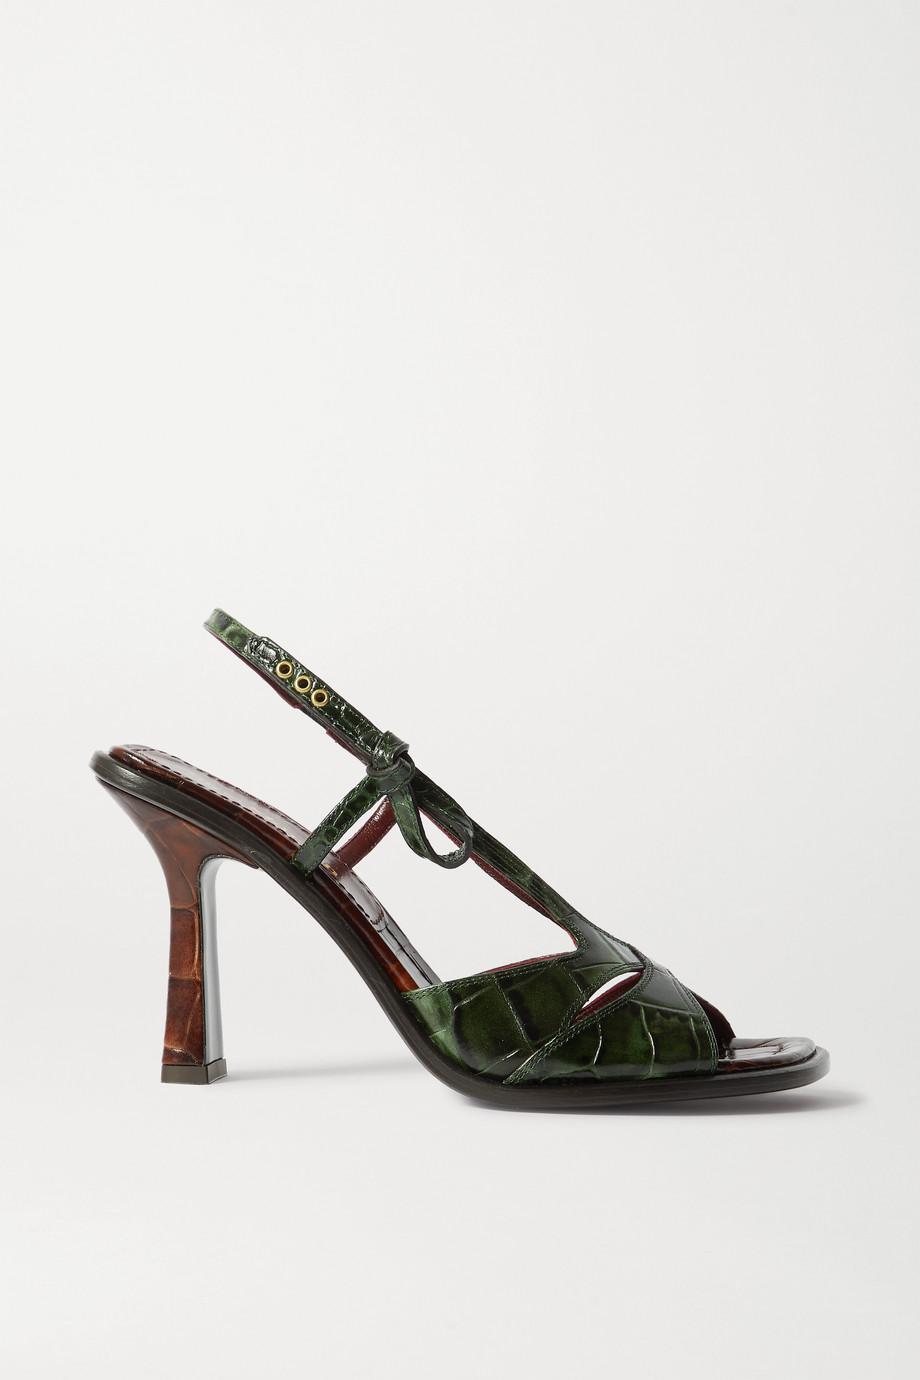 Sies Marjan Diana two-tone croc-effect leather slingback sandals